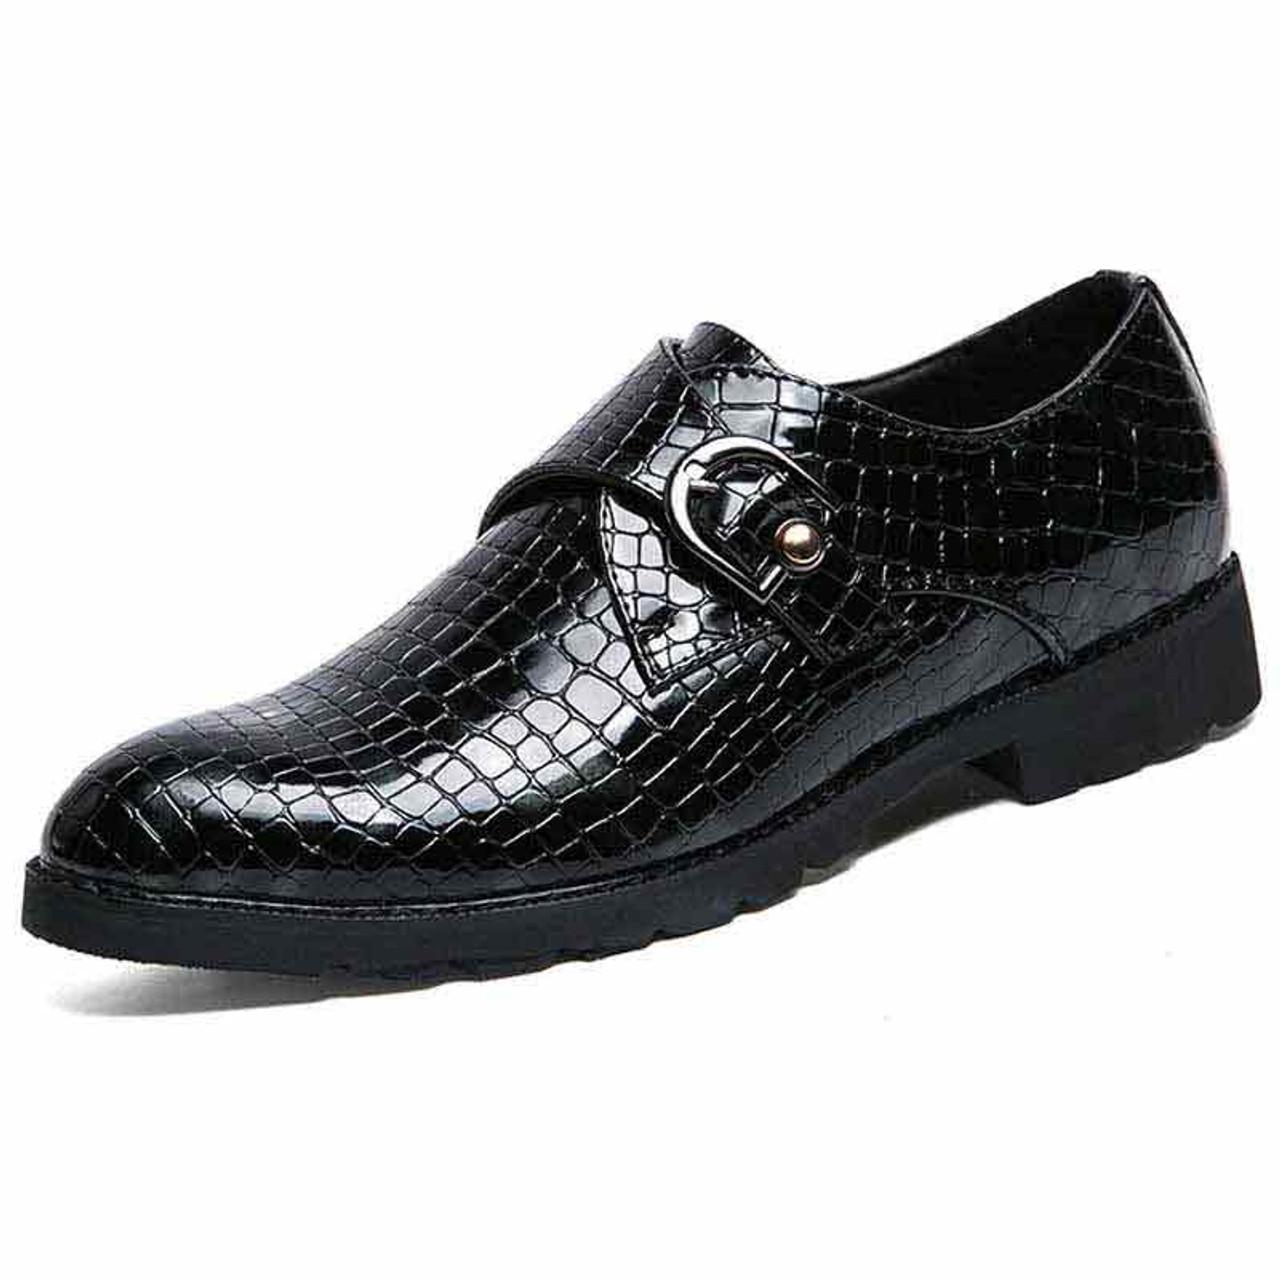 Black snake skin pattern monk strap